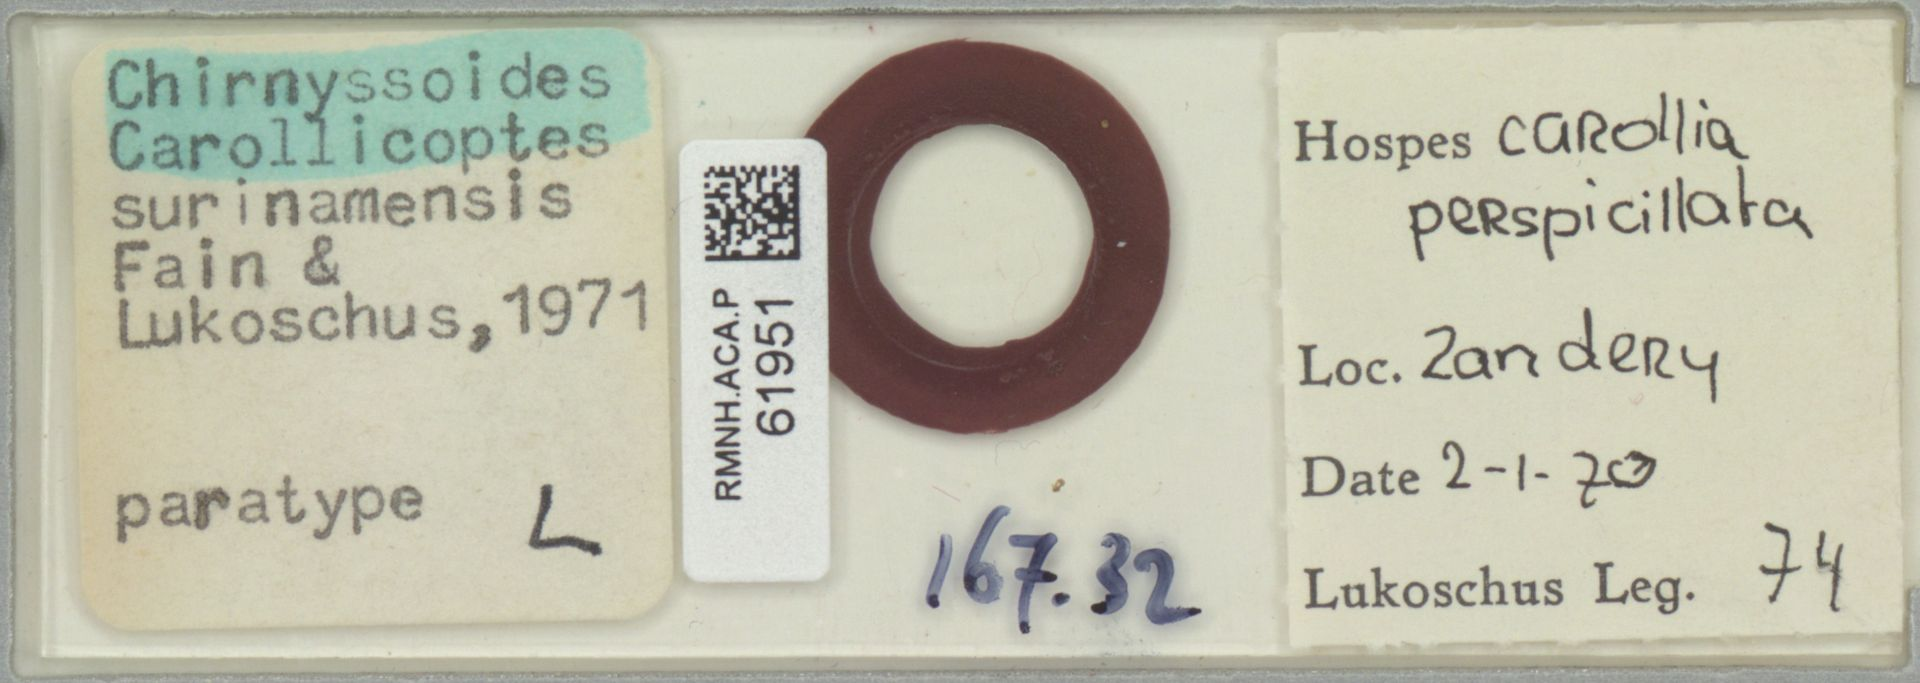 RMNH.ACA.P.61951 | Chirnyssoides carollicoptes surinamensis Fain & Lukoschus, 1971